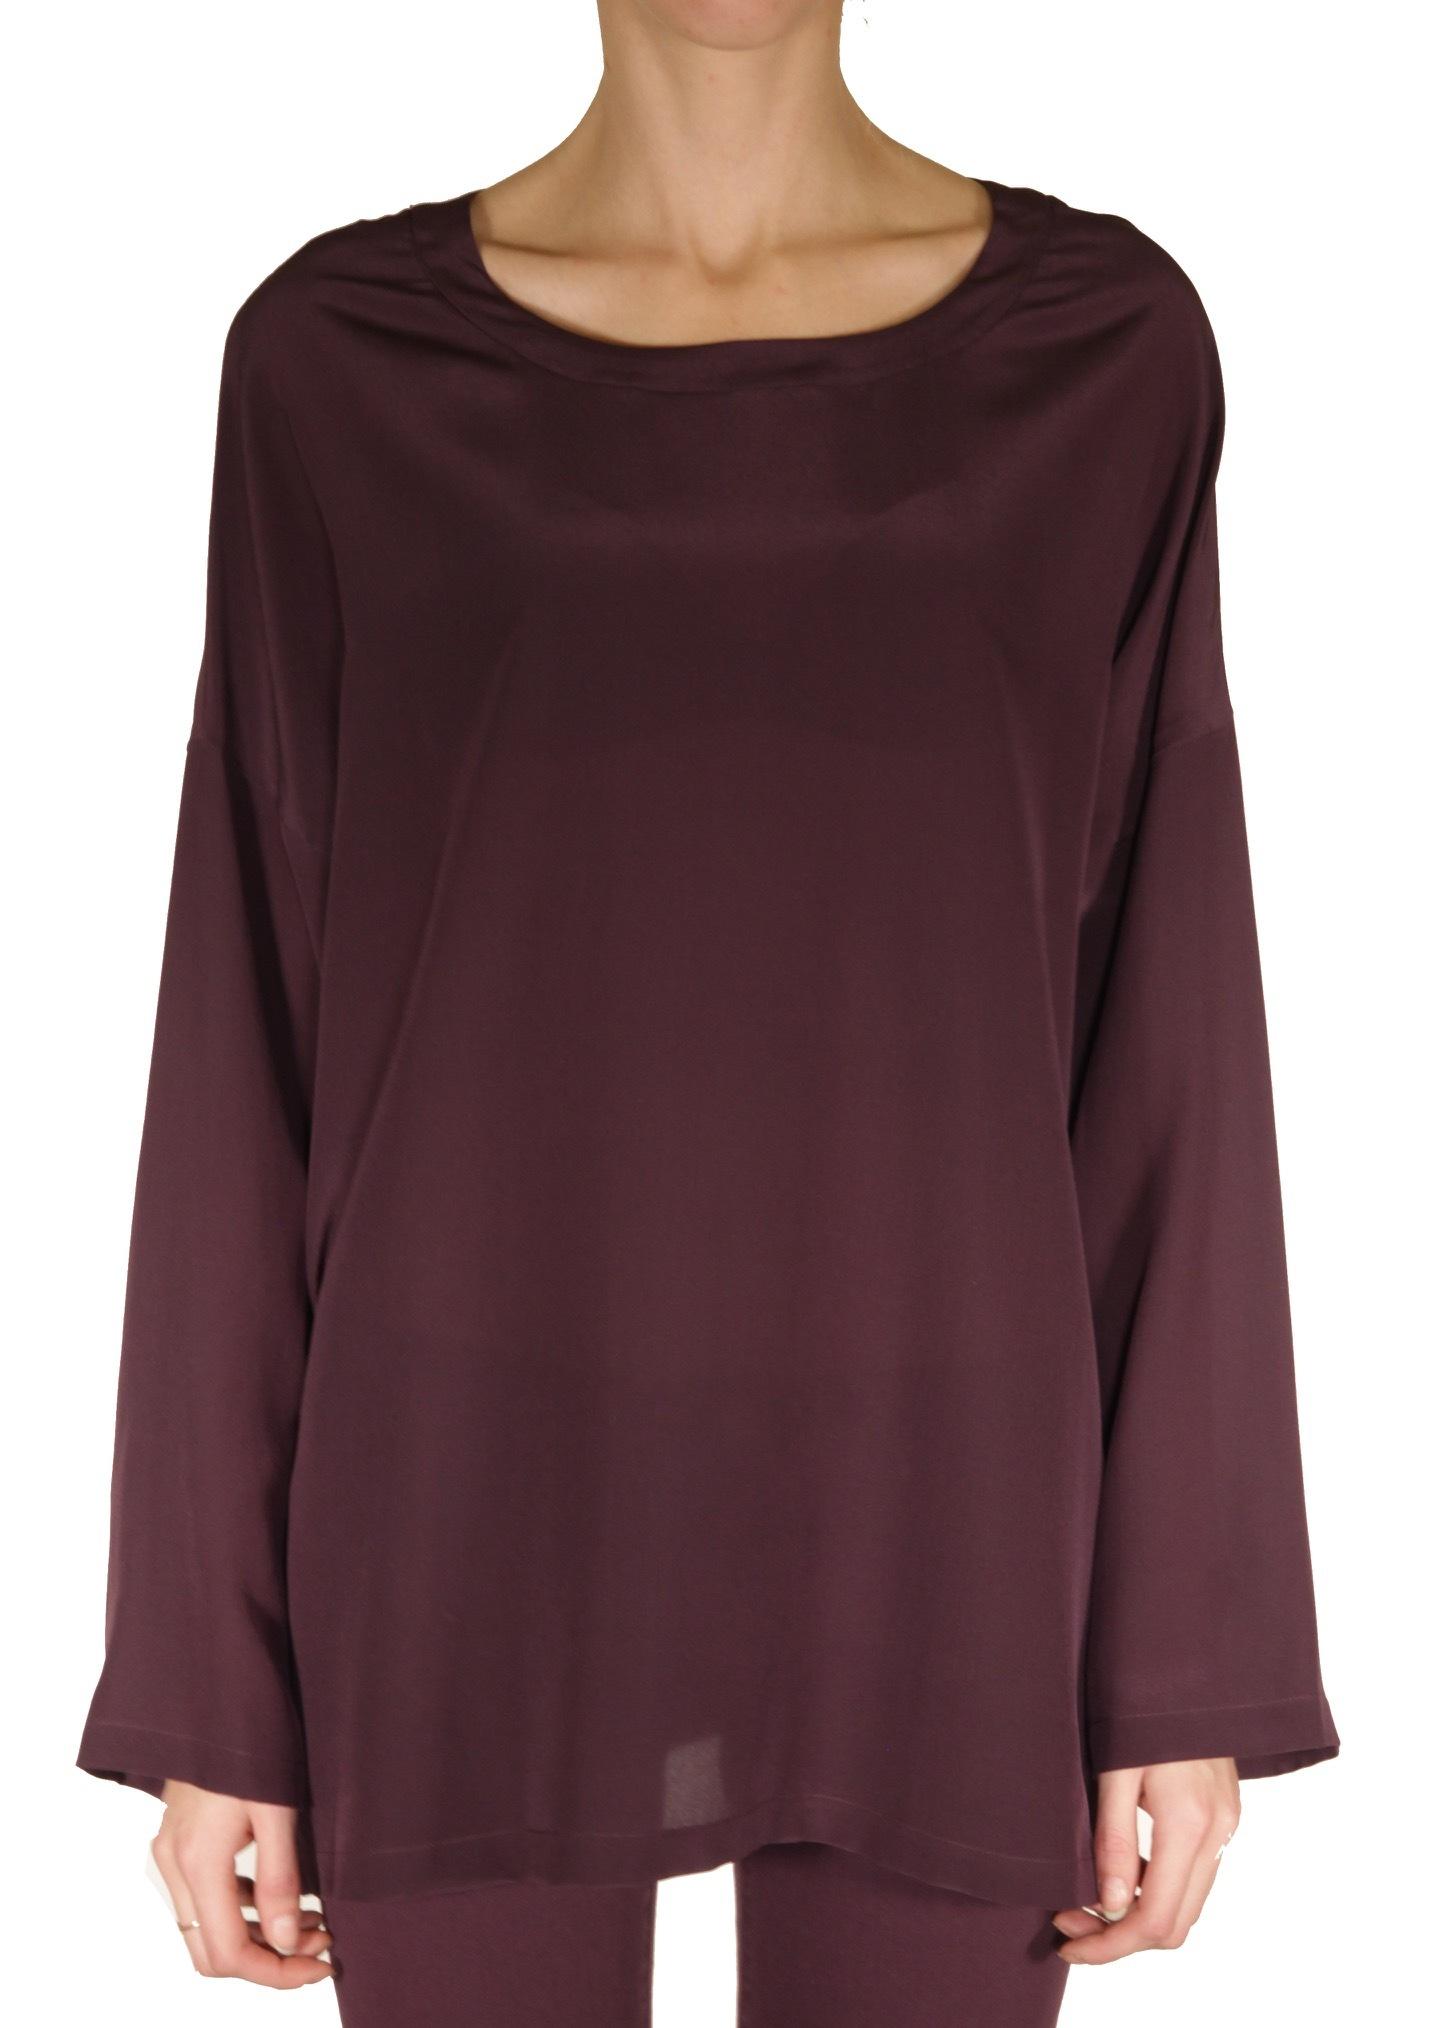 Блуза из шелка. Цвет антрацит/фиолетовый M MISSONI